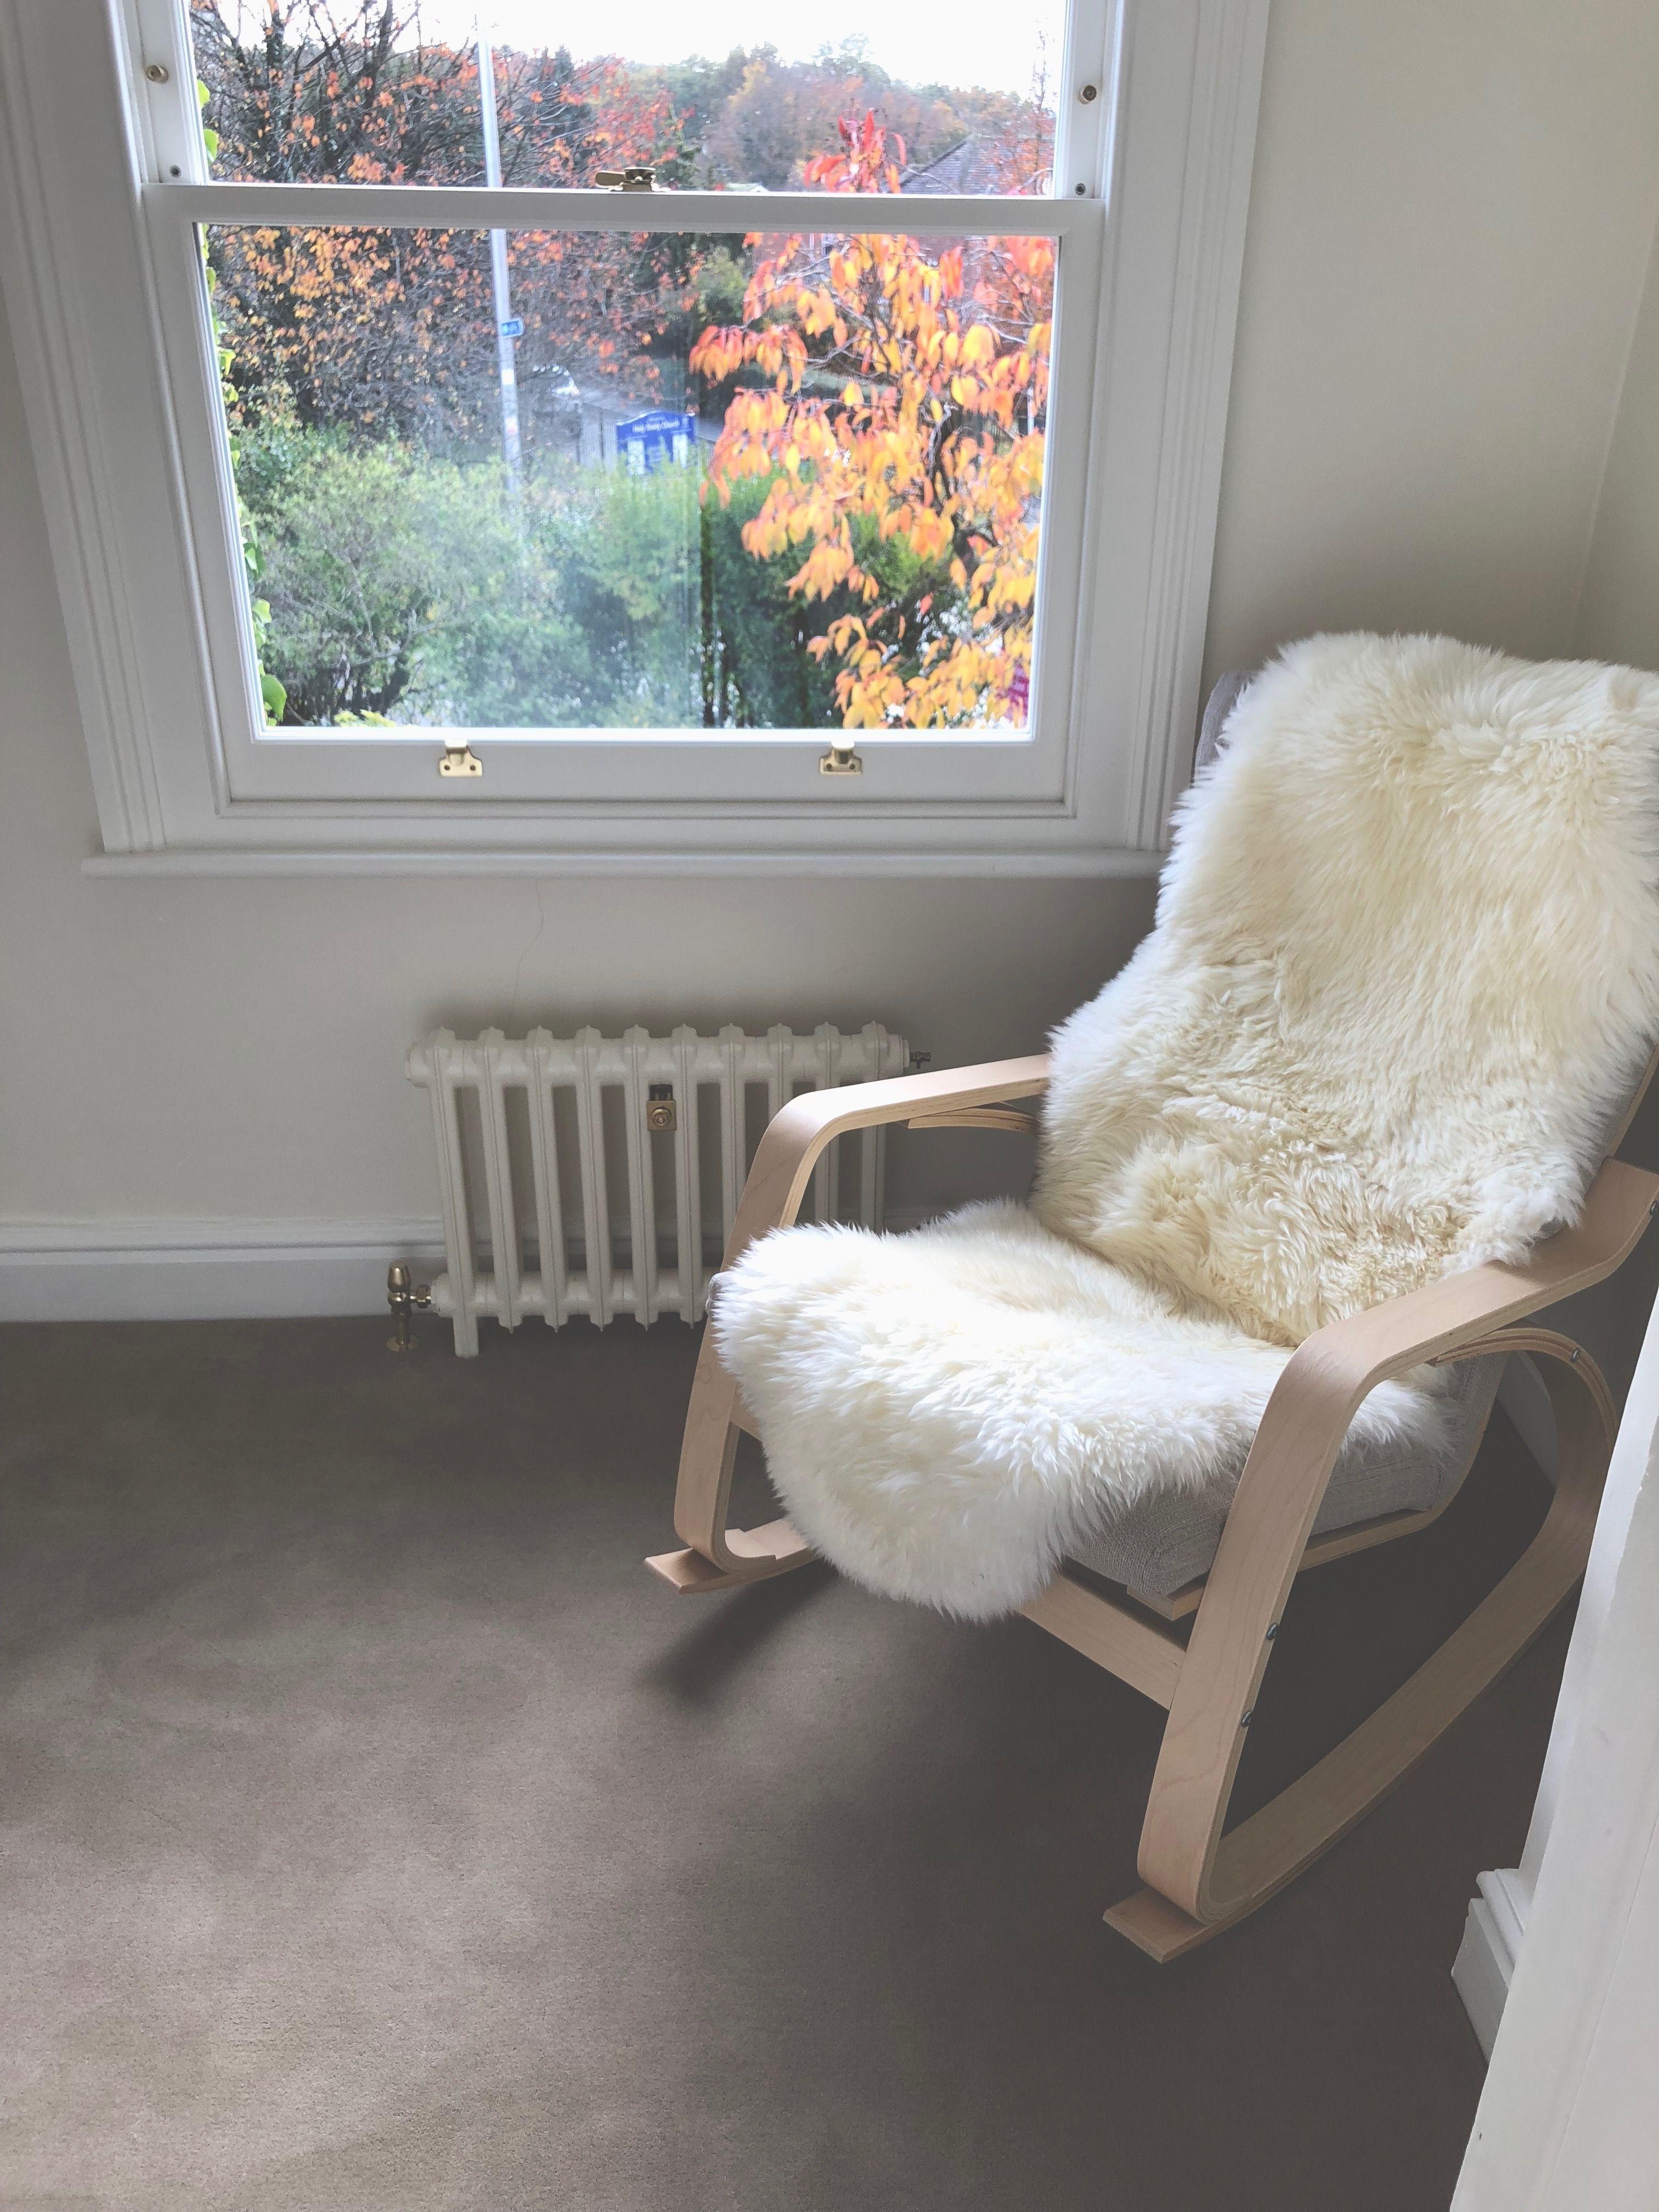 Nursing Chair Ikea Poang Rocker Nursery Neutrals Ermilk Sheepskin Rug